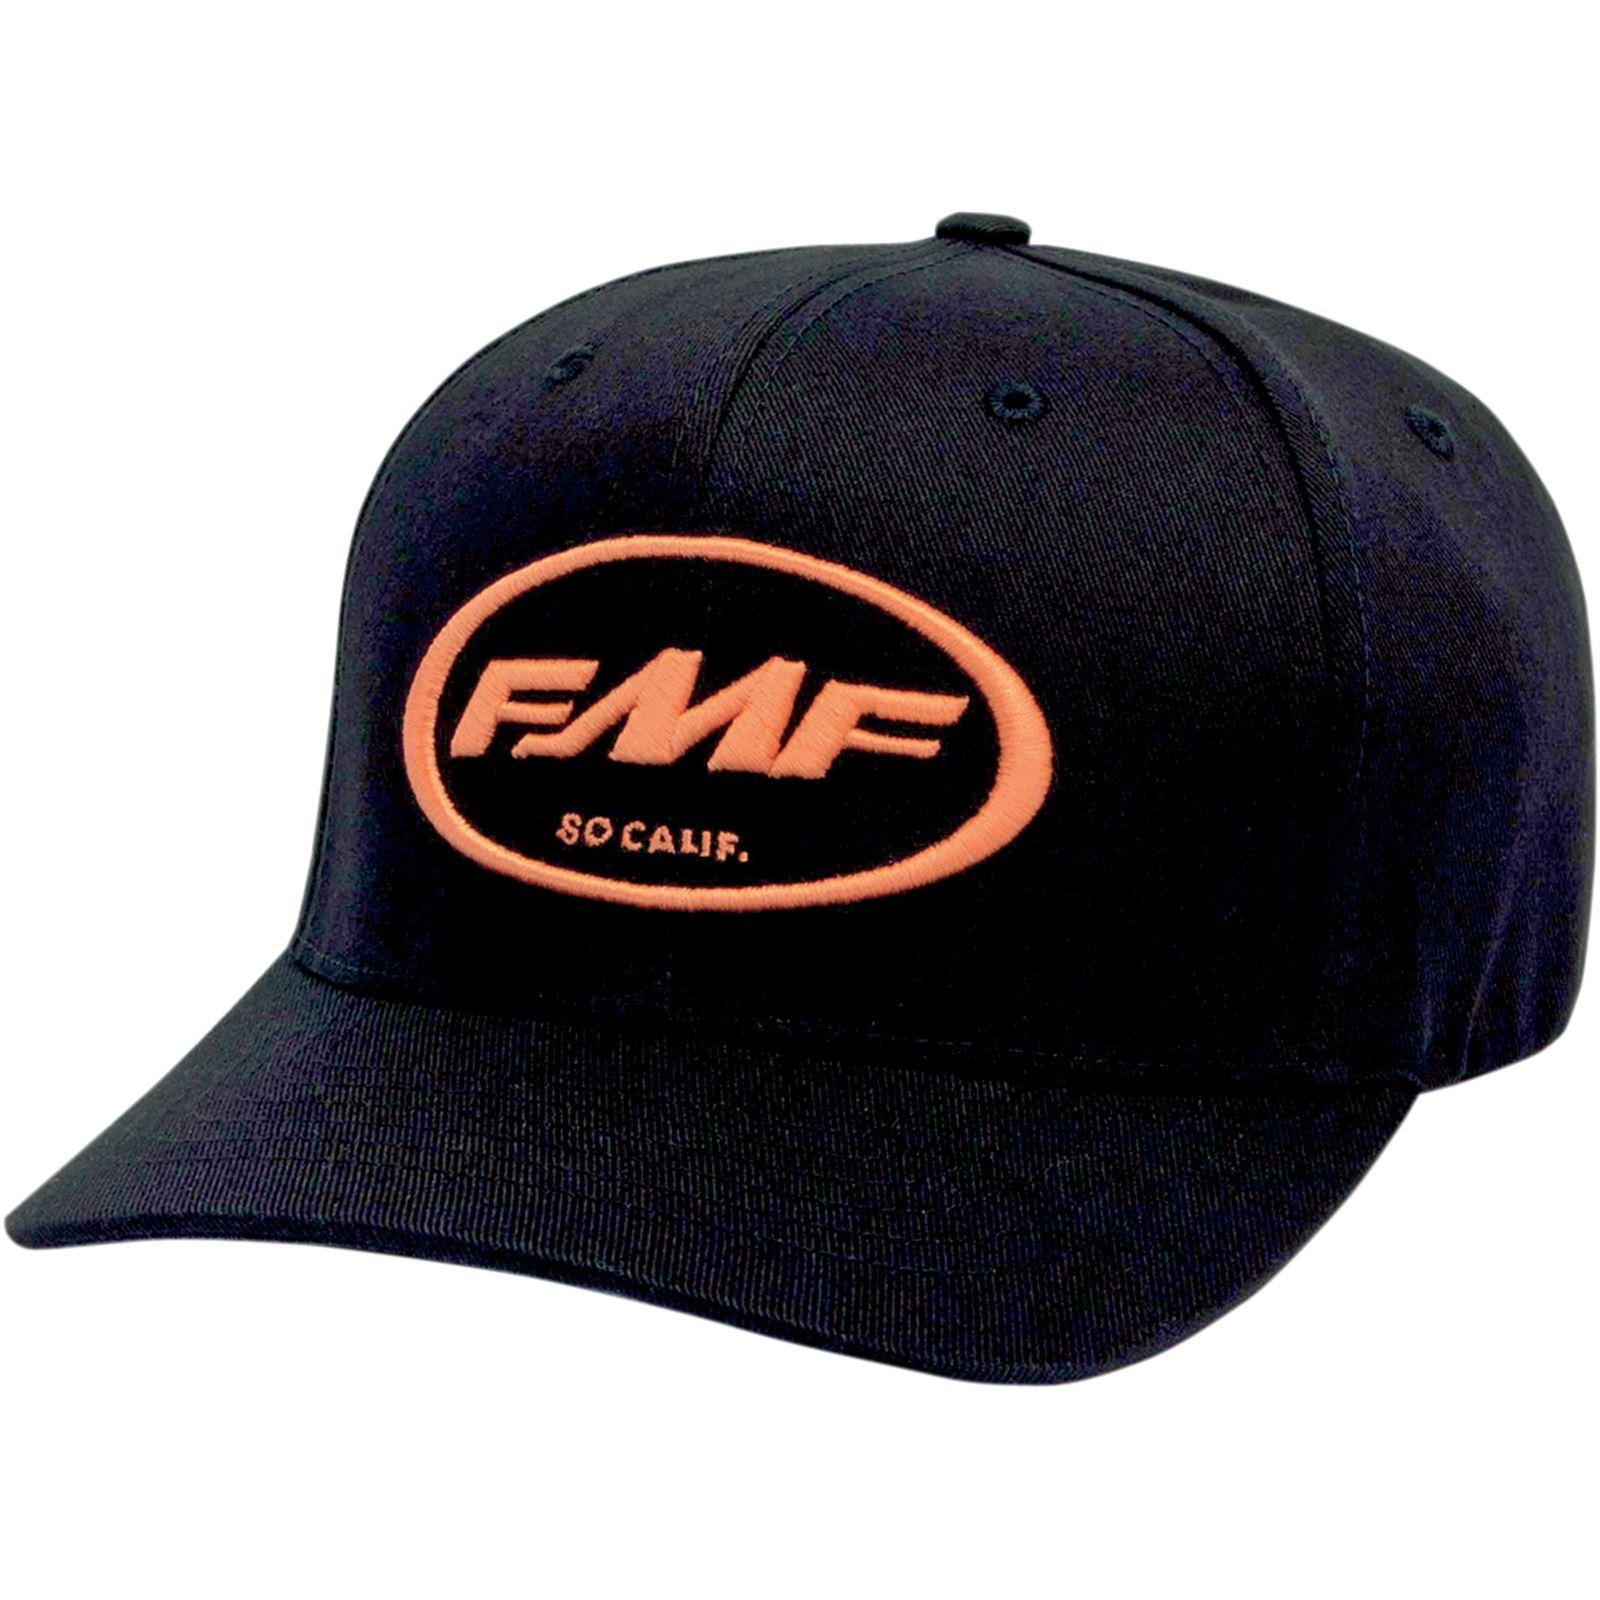 FMF Racing Factory Don Hat - Black/Orange - Large/X-Large